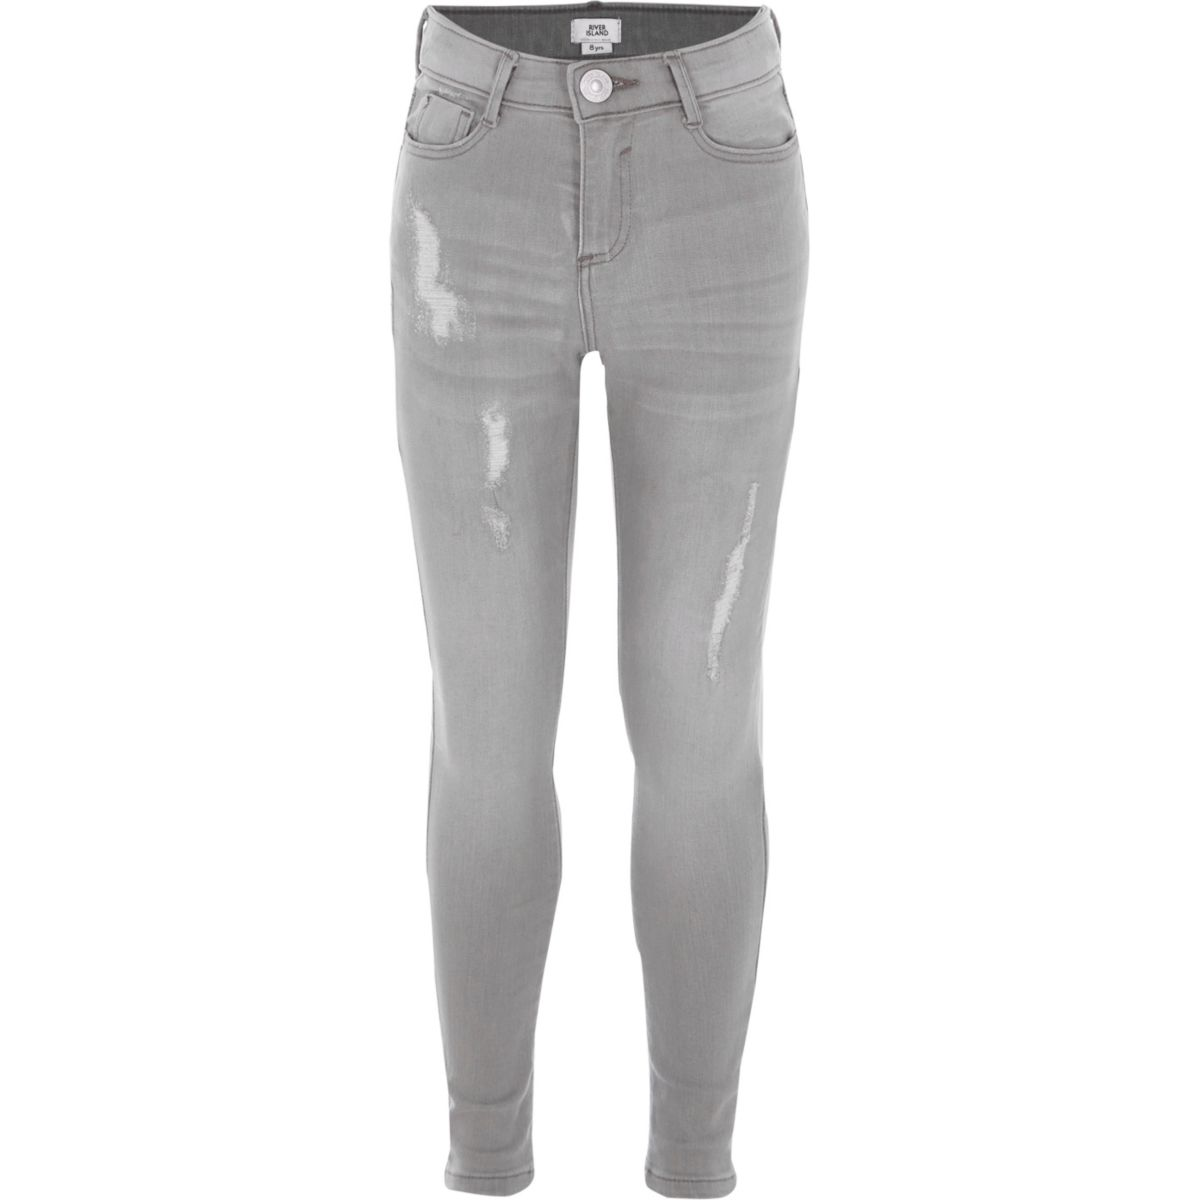 Girls light grey ripped Amelie skinny jeans